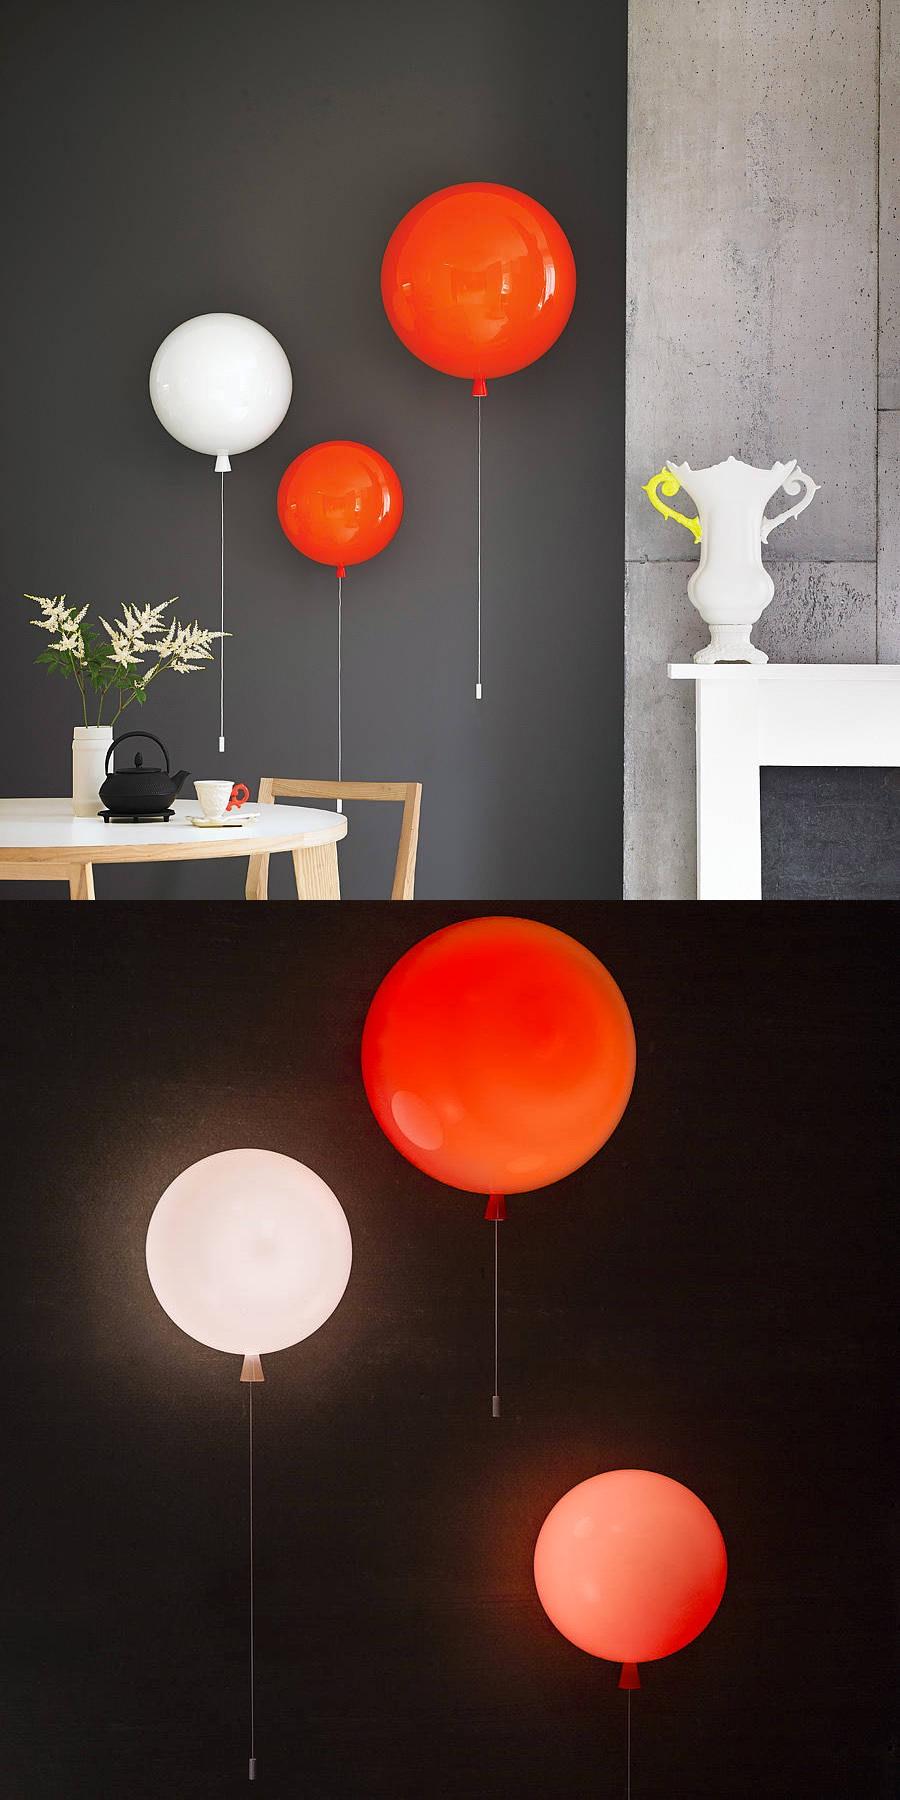 Wall String Lights For Bedroom: A Set Of Extraordinary Lights